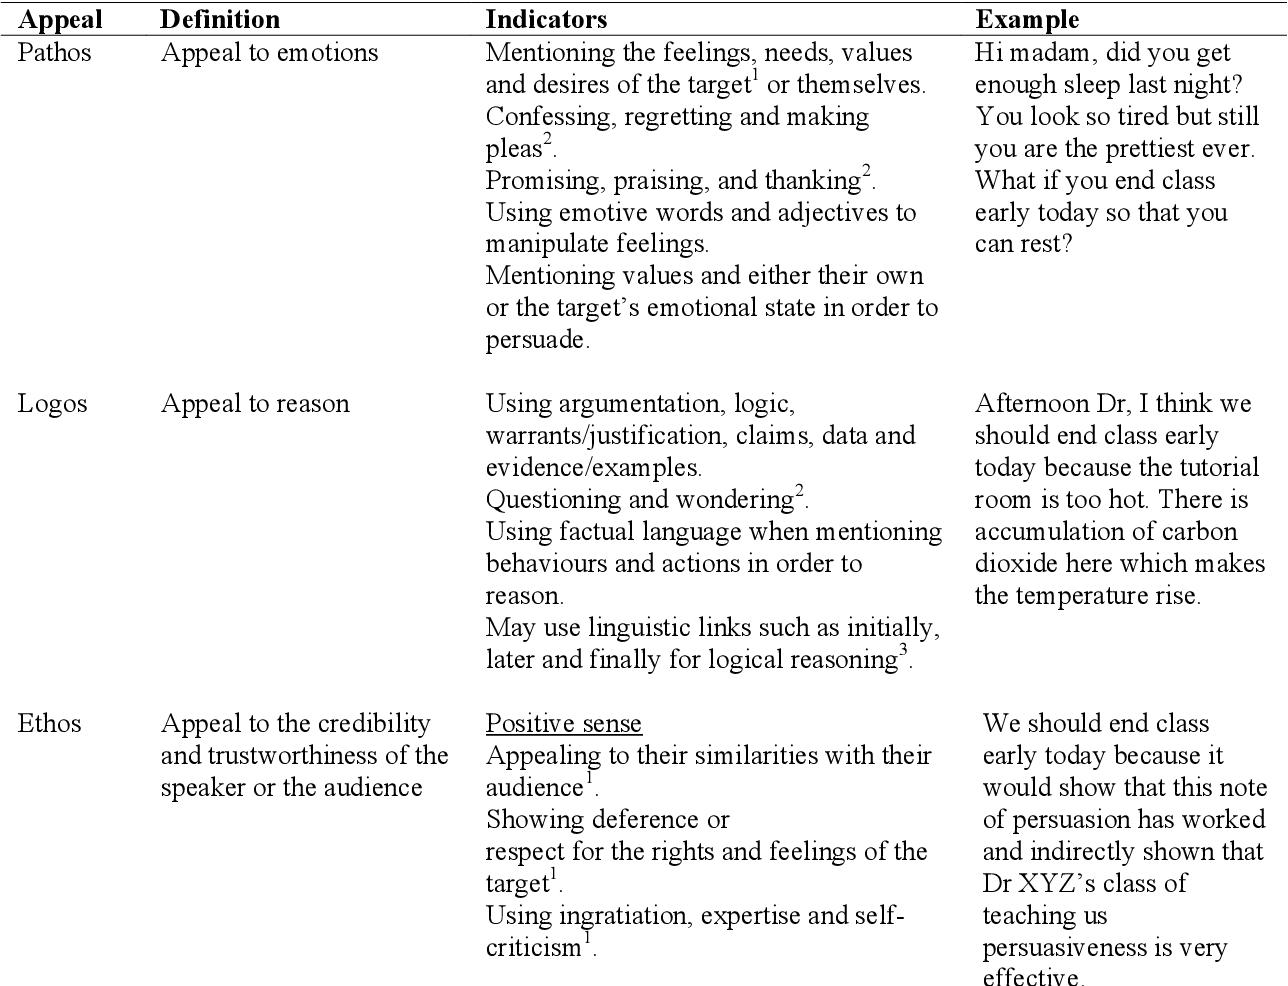 Pdf Ethos Logos And Pathos In University Students Informal Requests Semantic Scholar